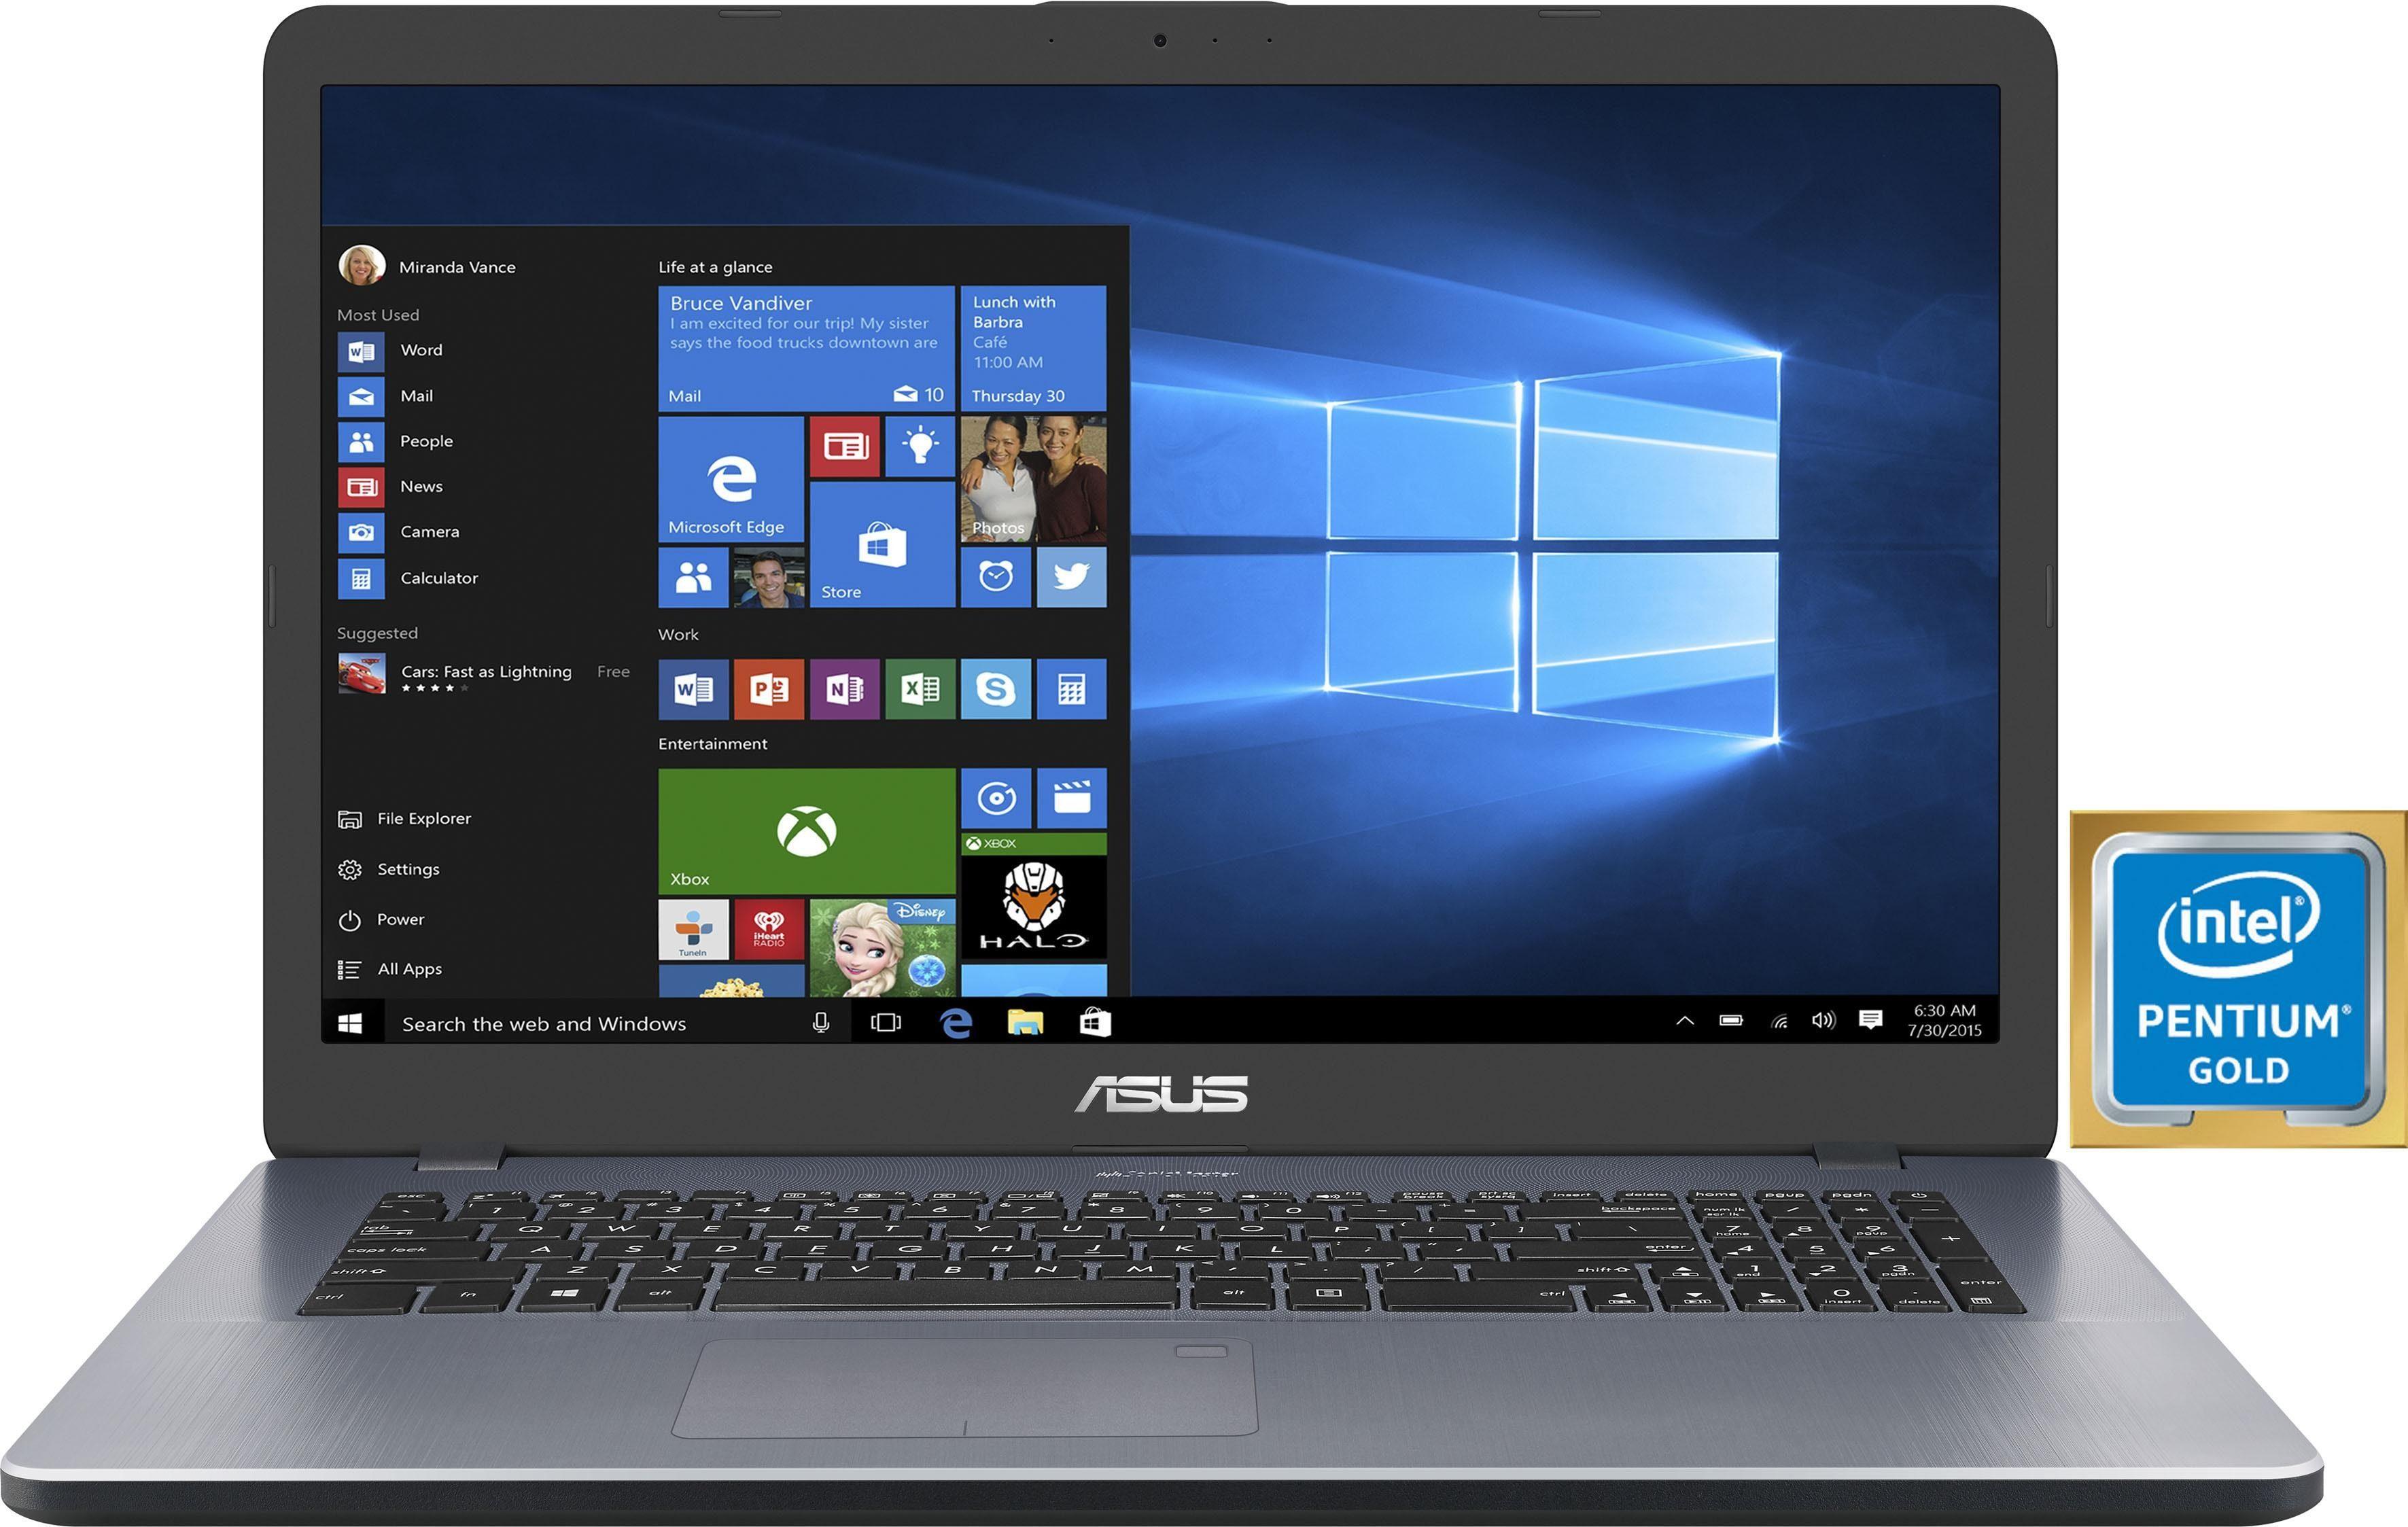 Asus VivoBook 17 F705UA Notebook (43,94 cm/17,3 Zoll, Intel Pentium Gold, HD, 1000 GB HDD)